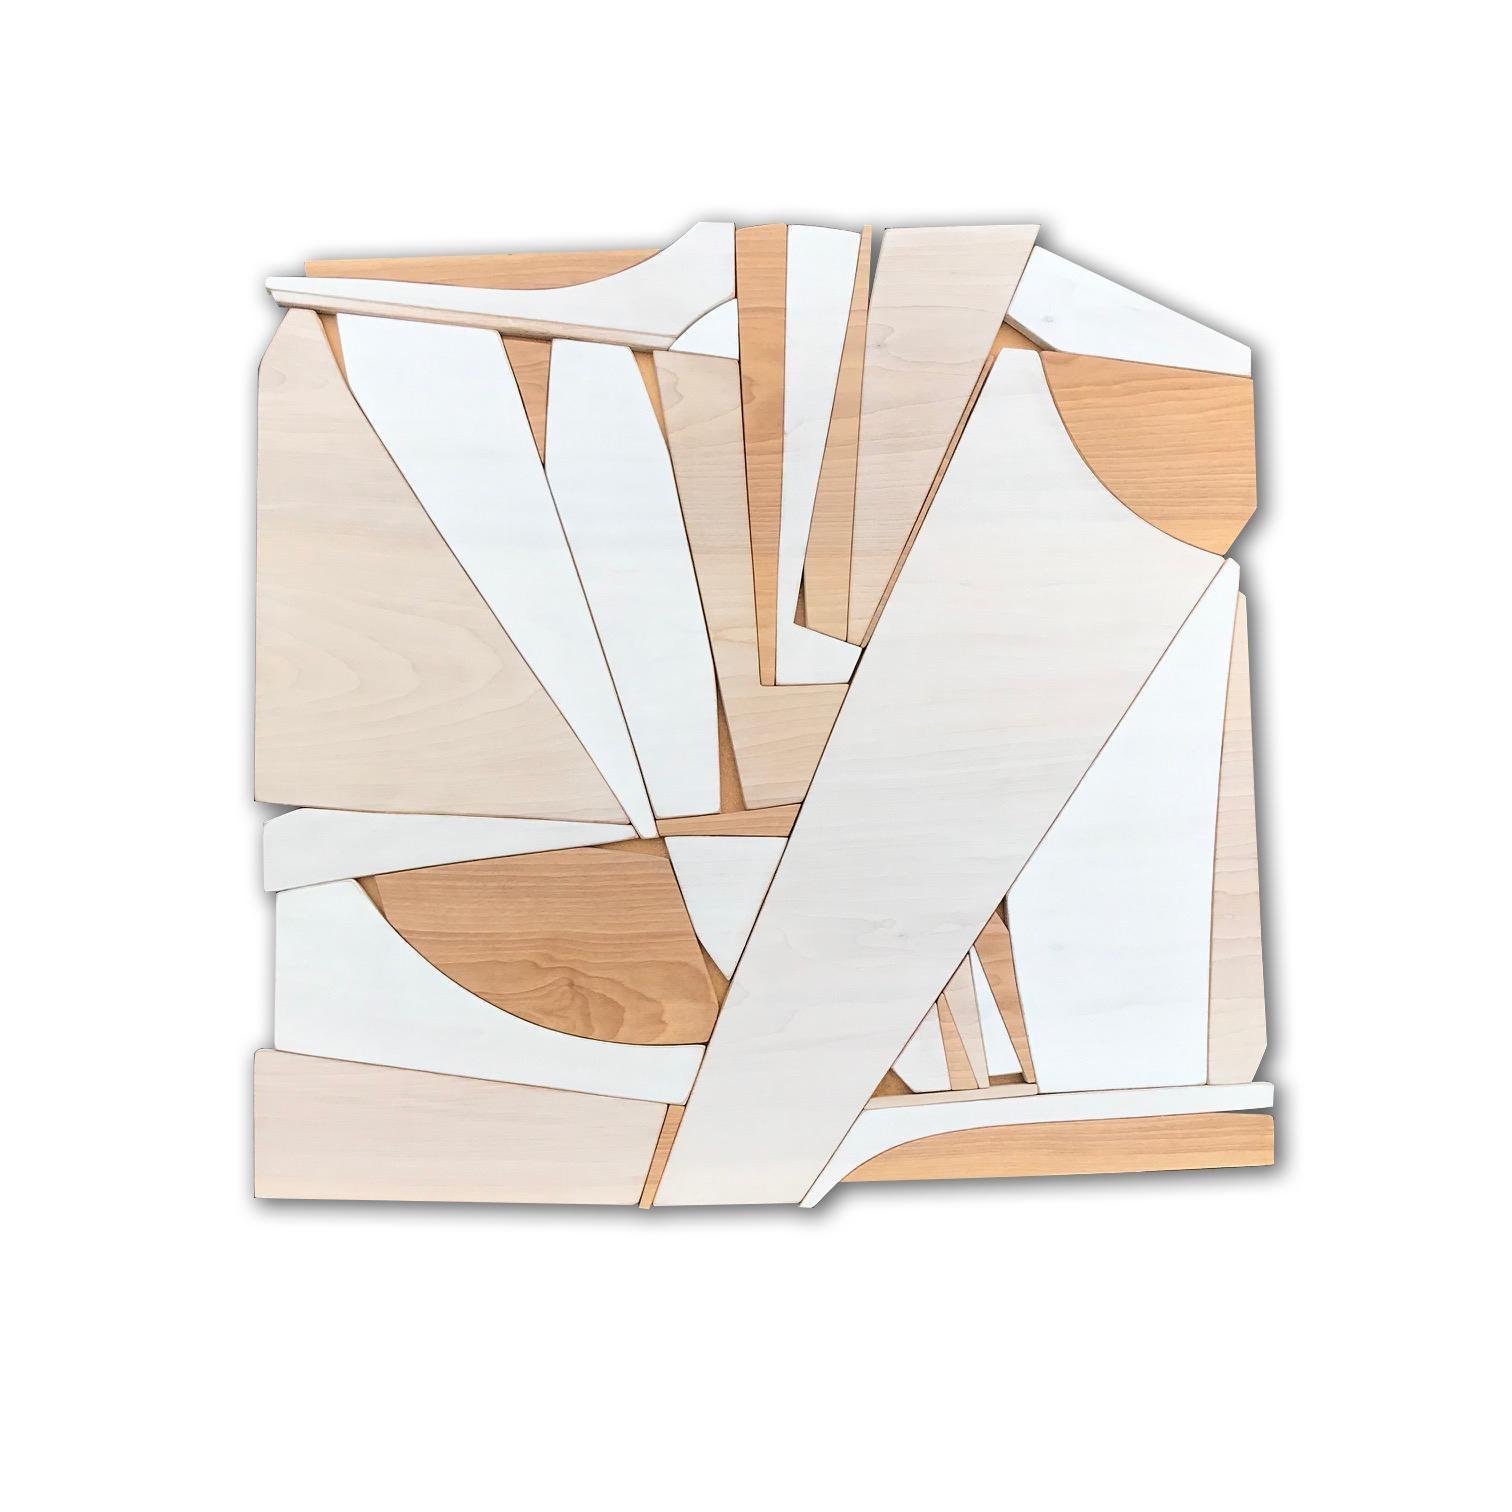 Leisure Class II (modern abstract wall art minimal geometric design neutral wood